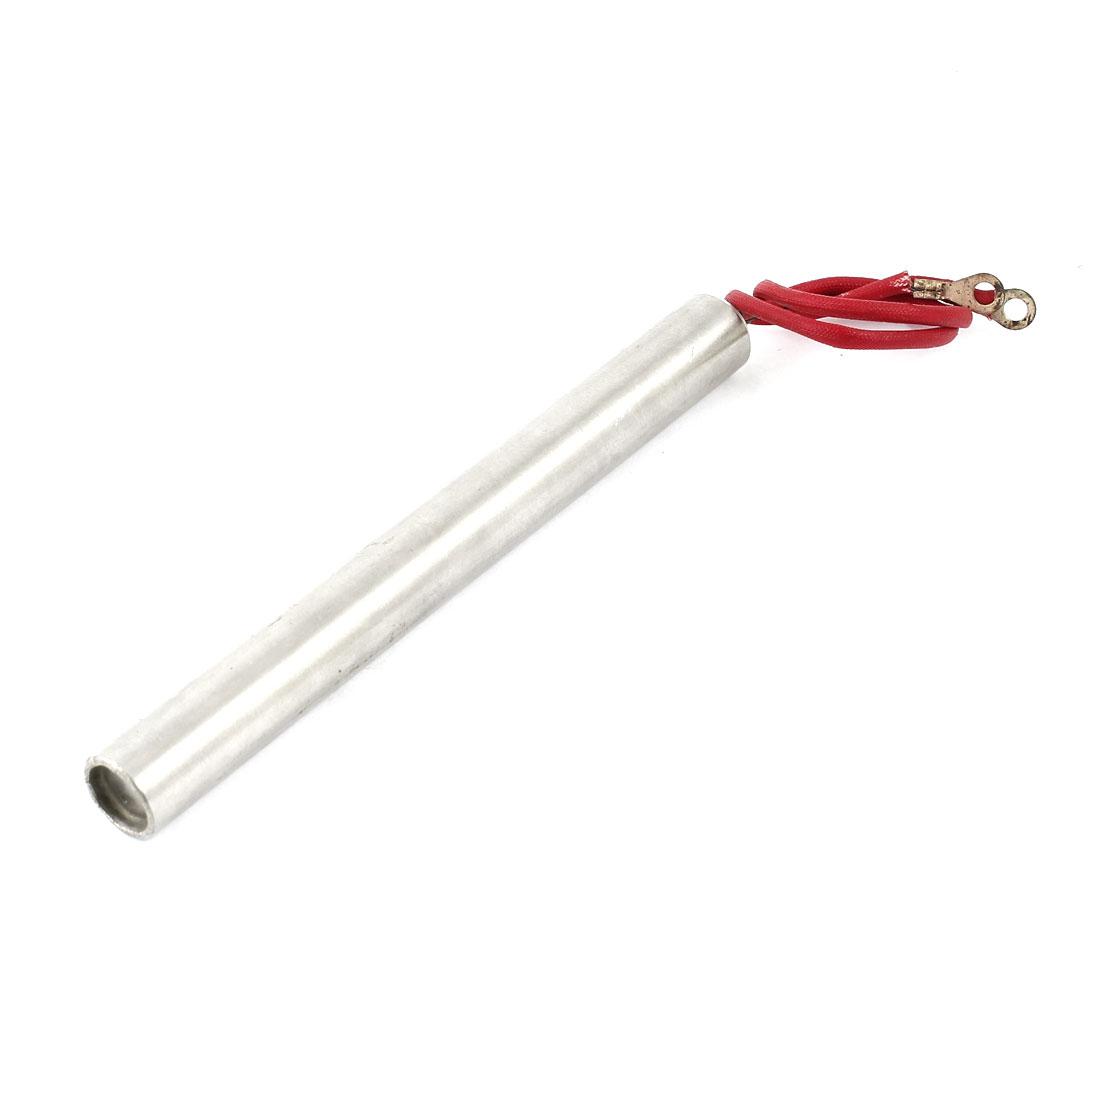 Single Head Red Two-wire Cartridge Heater 220V 300W 16mm x 150mm